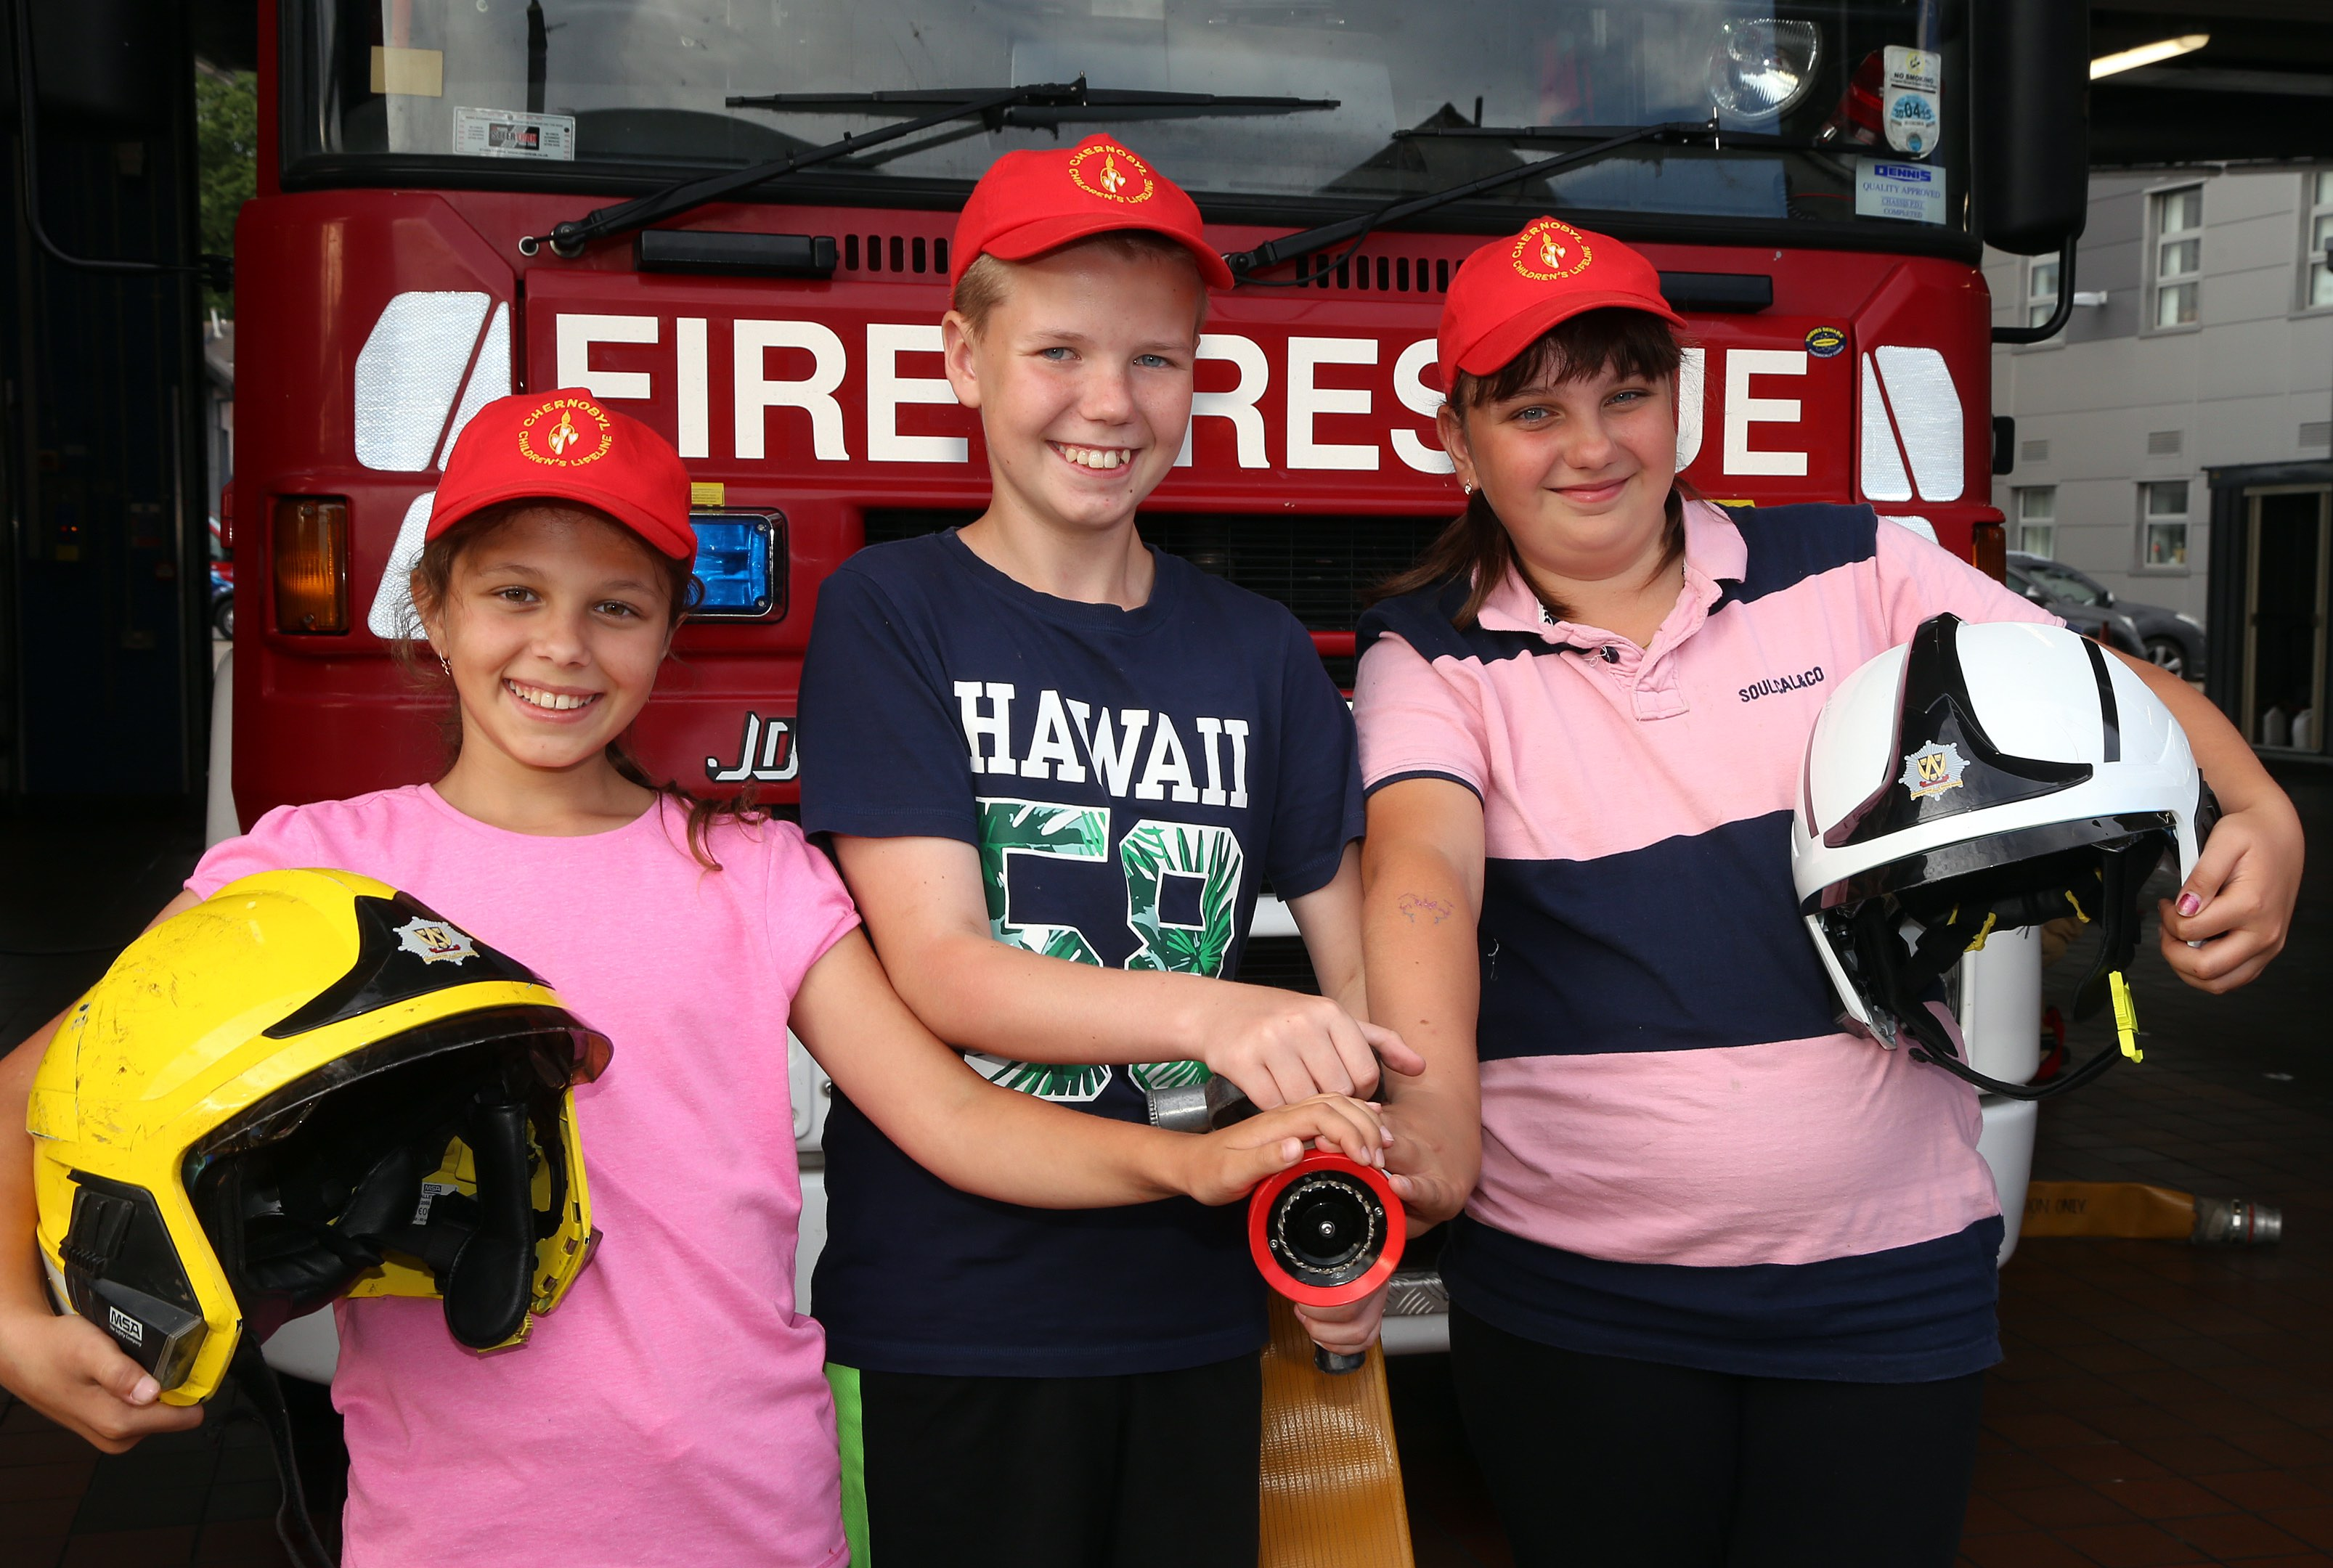 The children with the hose and helmets are L-R, Diana Kamesh (10), Andrey Demidenko (11) and Mariya Kuzmenko (12).